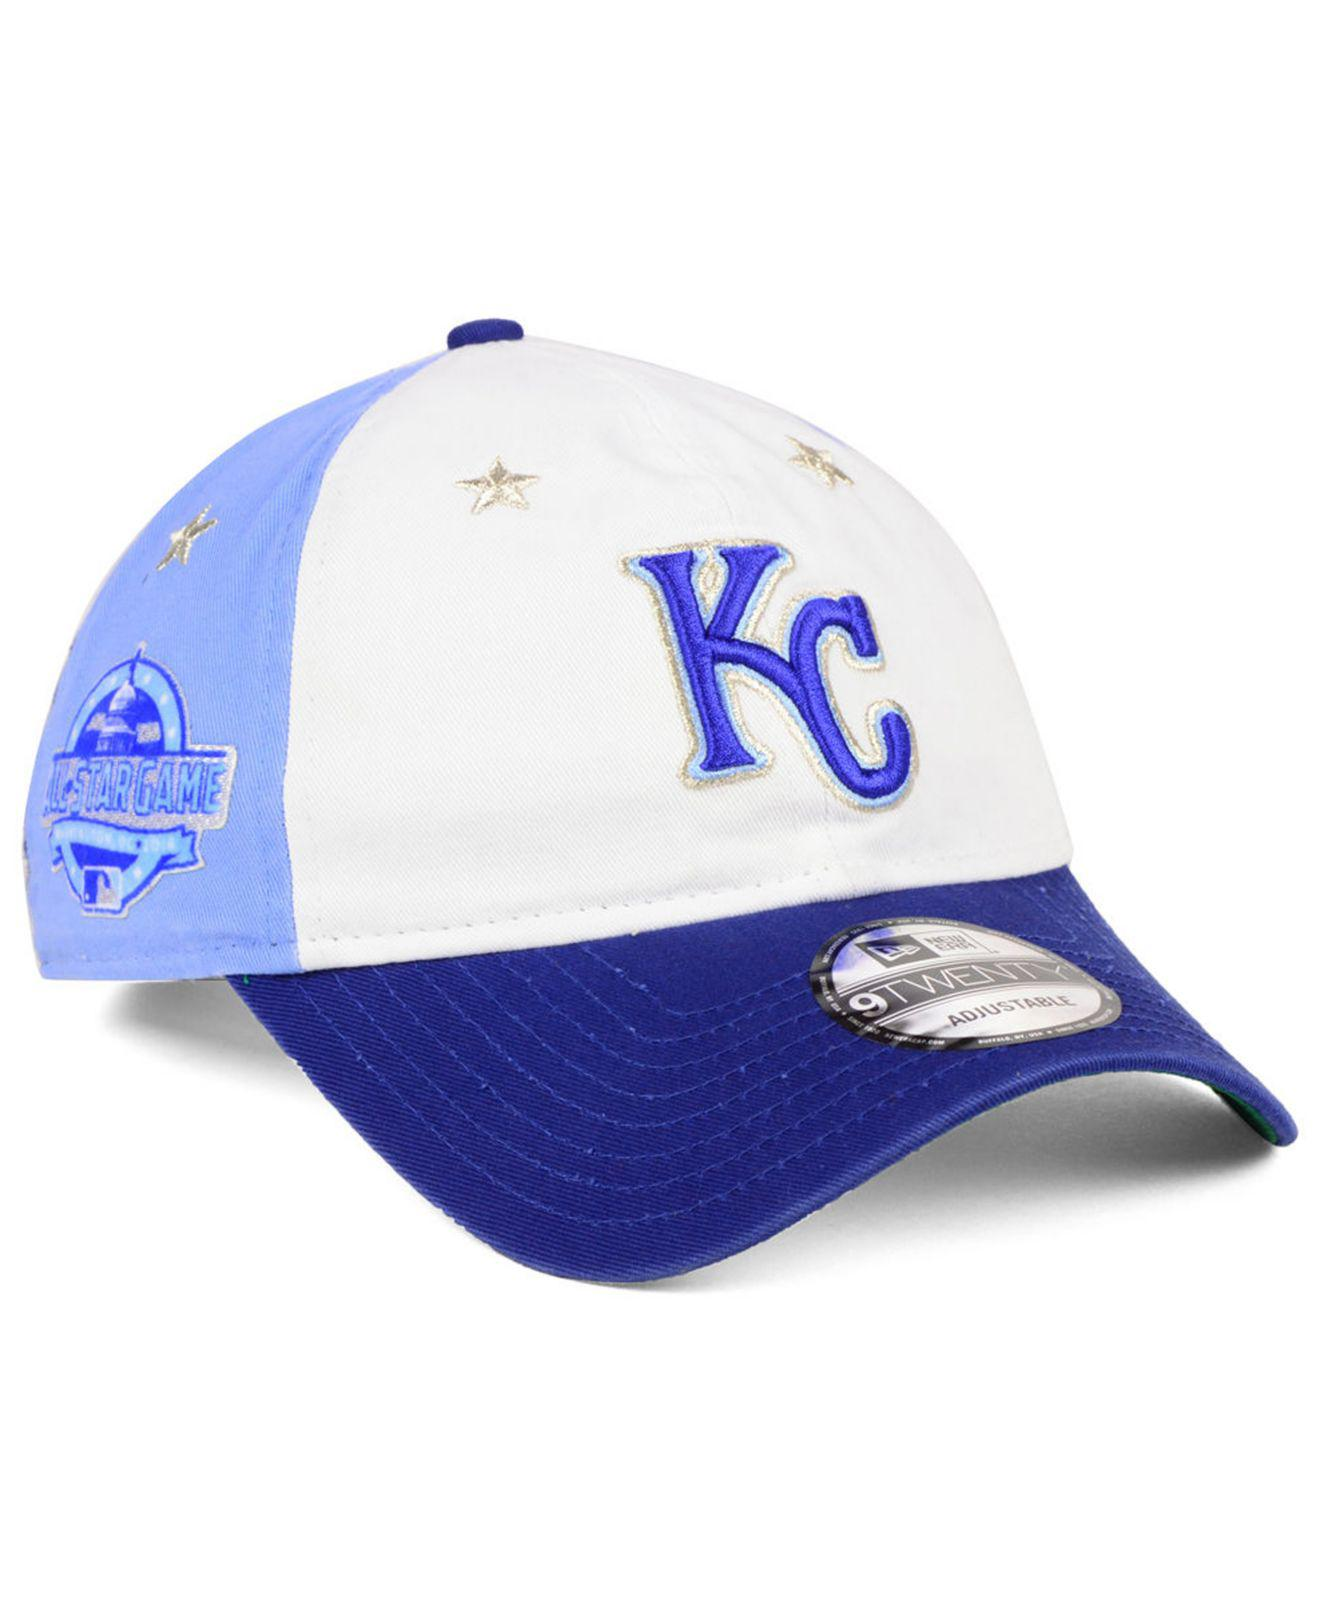 KTZ - Blue Kansas City Royals All Star Game 9twenty Strapback Cap 2018 for  Men -. View fullscreen fd0691b41edd